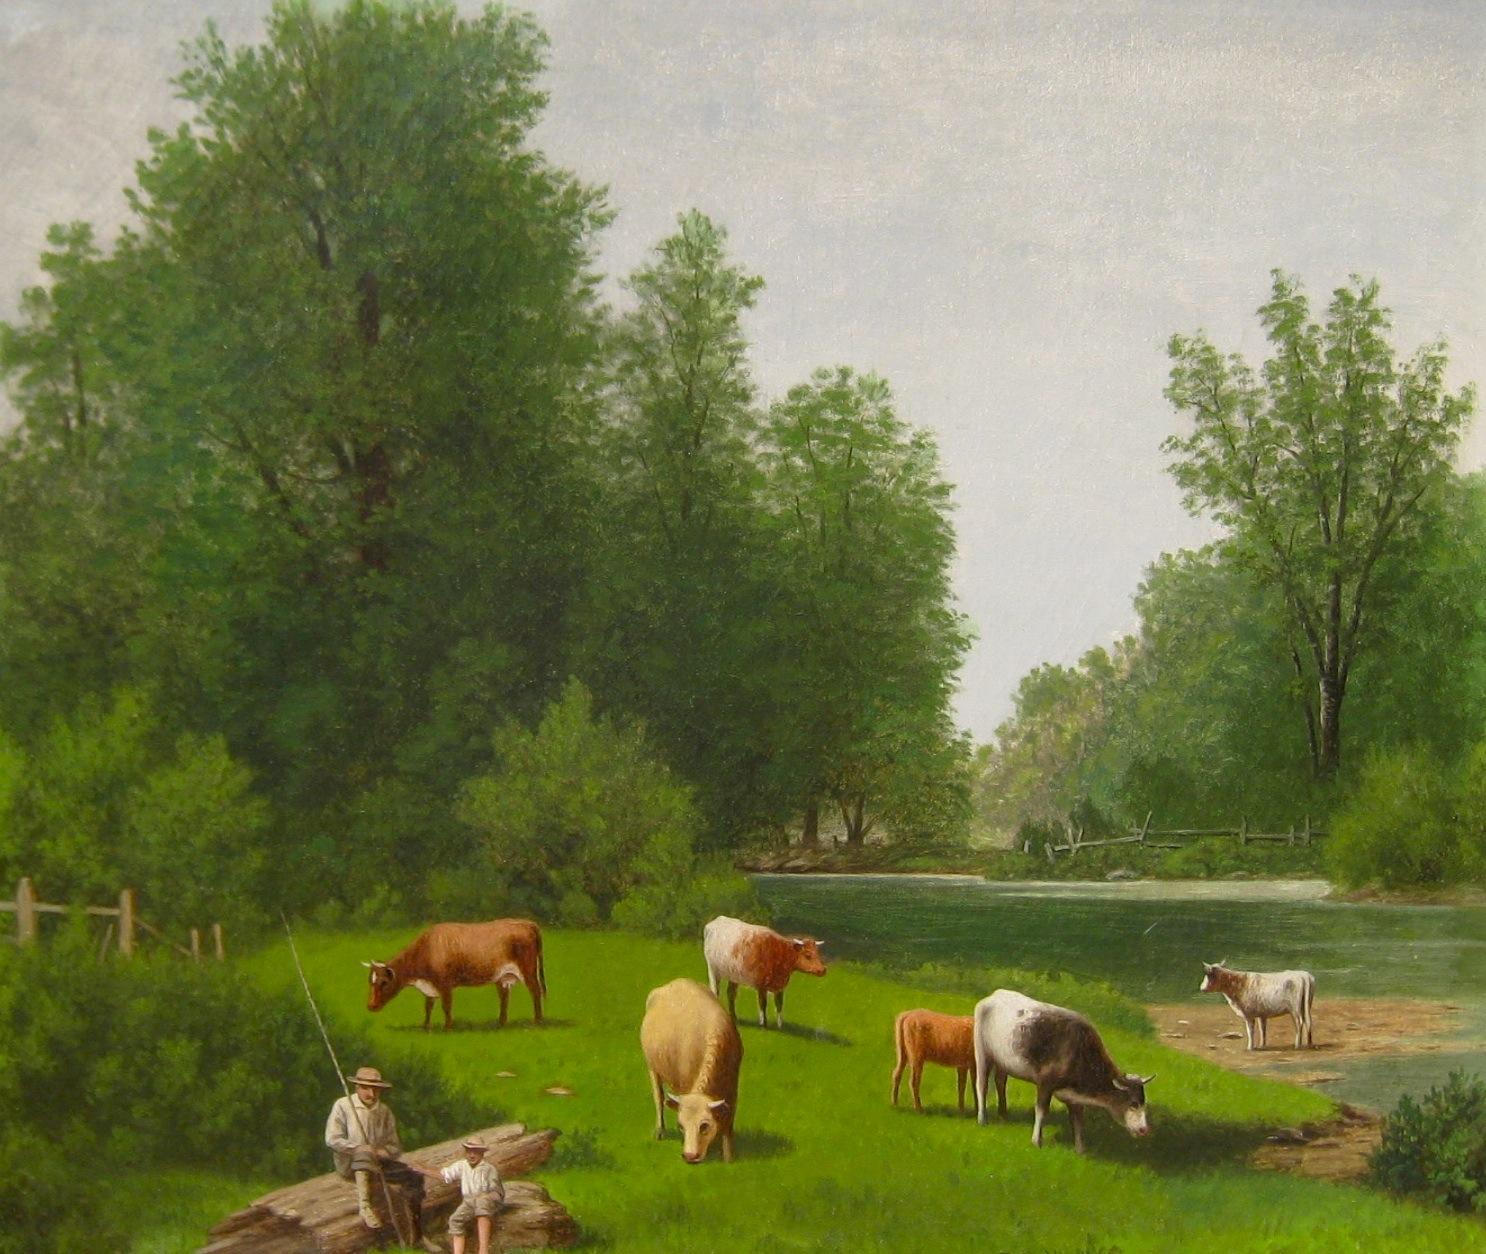 hays-cowsfishing-cropped